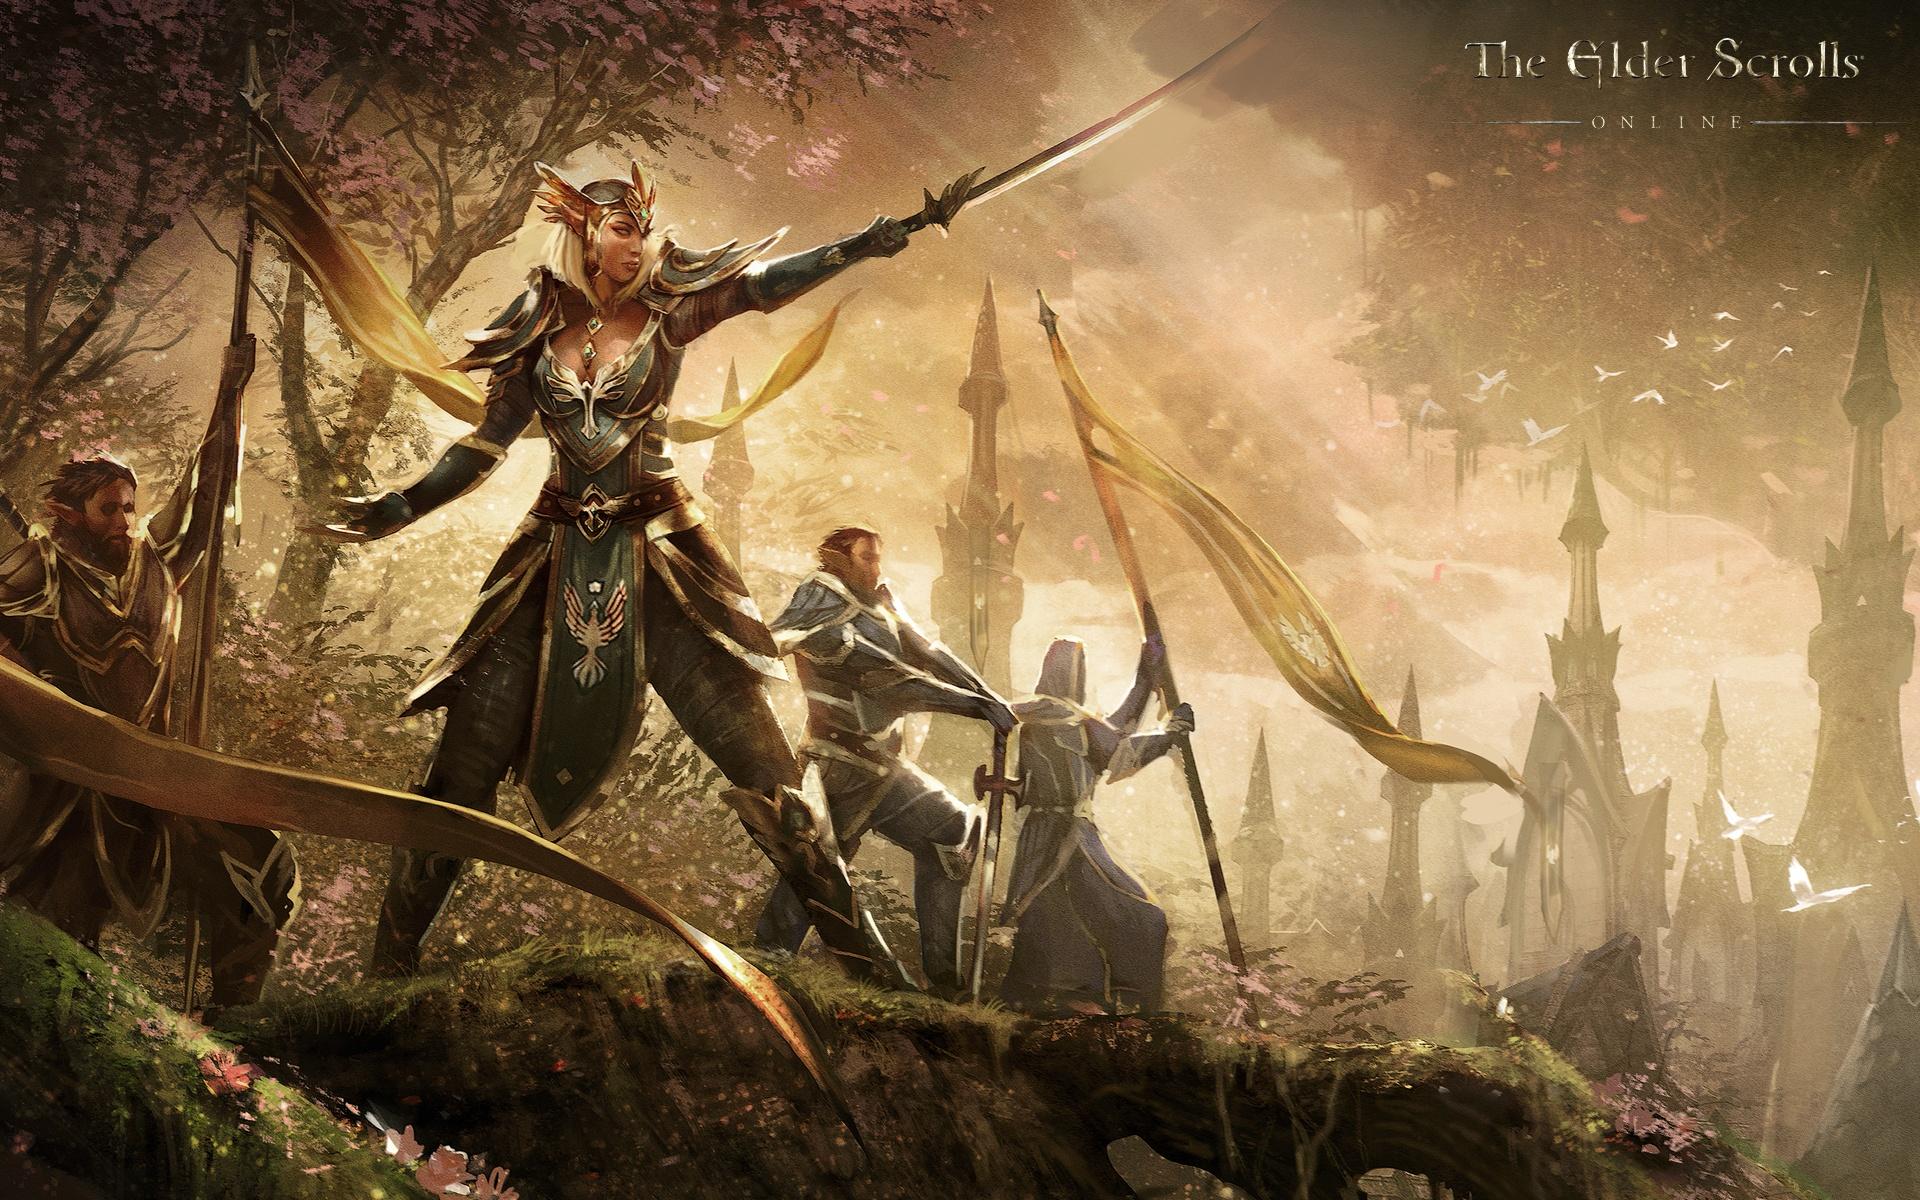 The Elder Scroll Online Res: 1920x1200 / Size:1193kb. Views: 55892